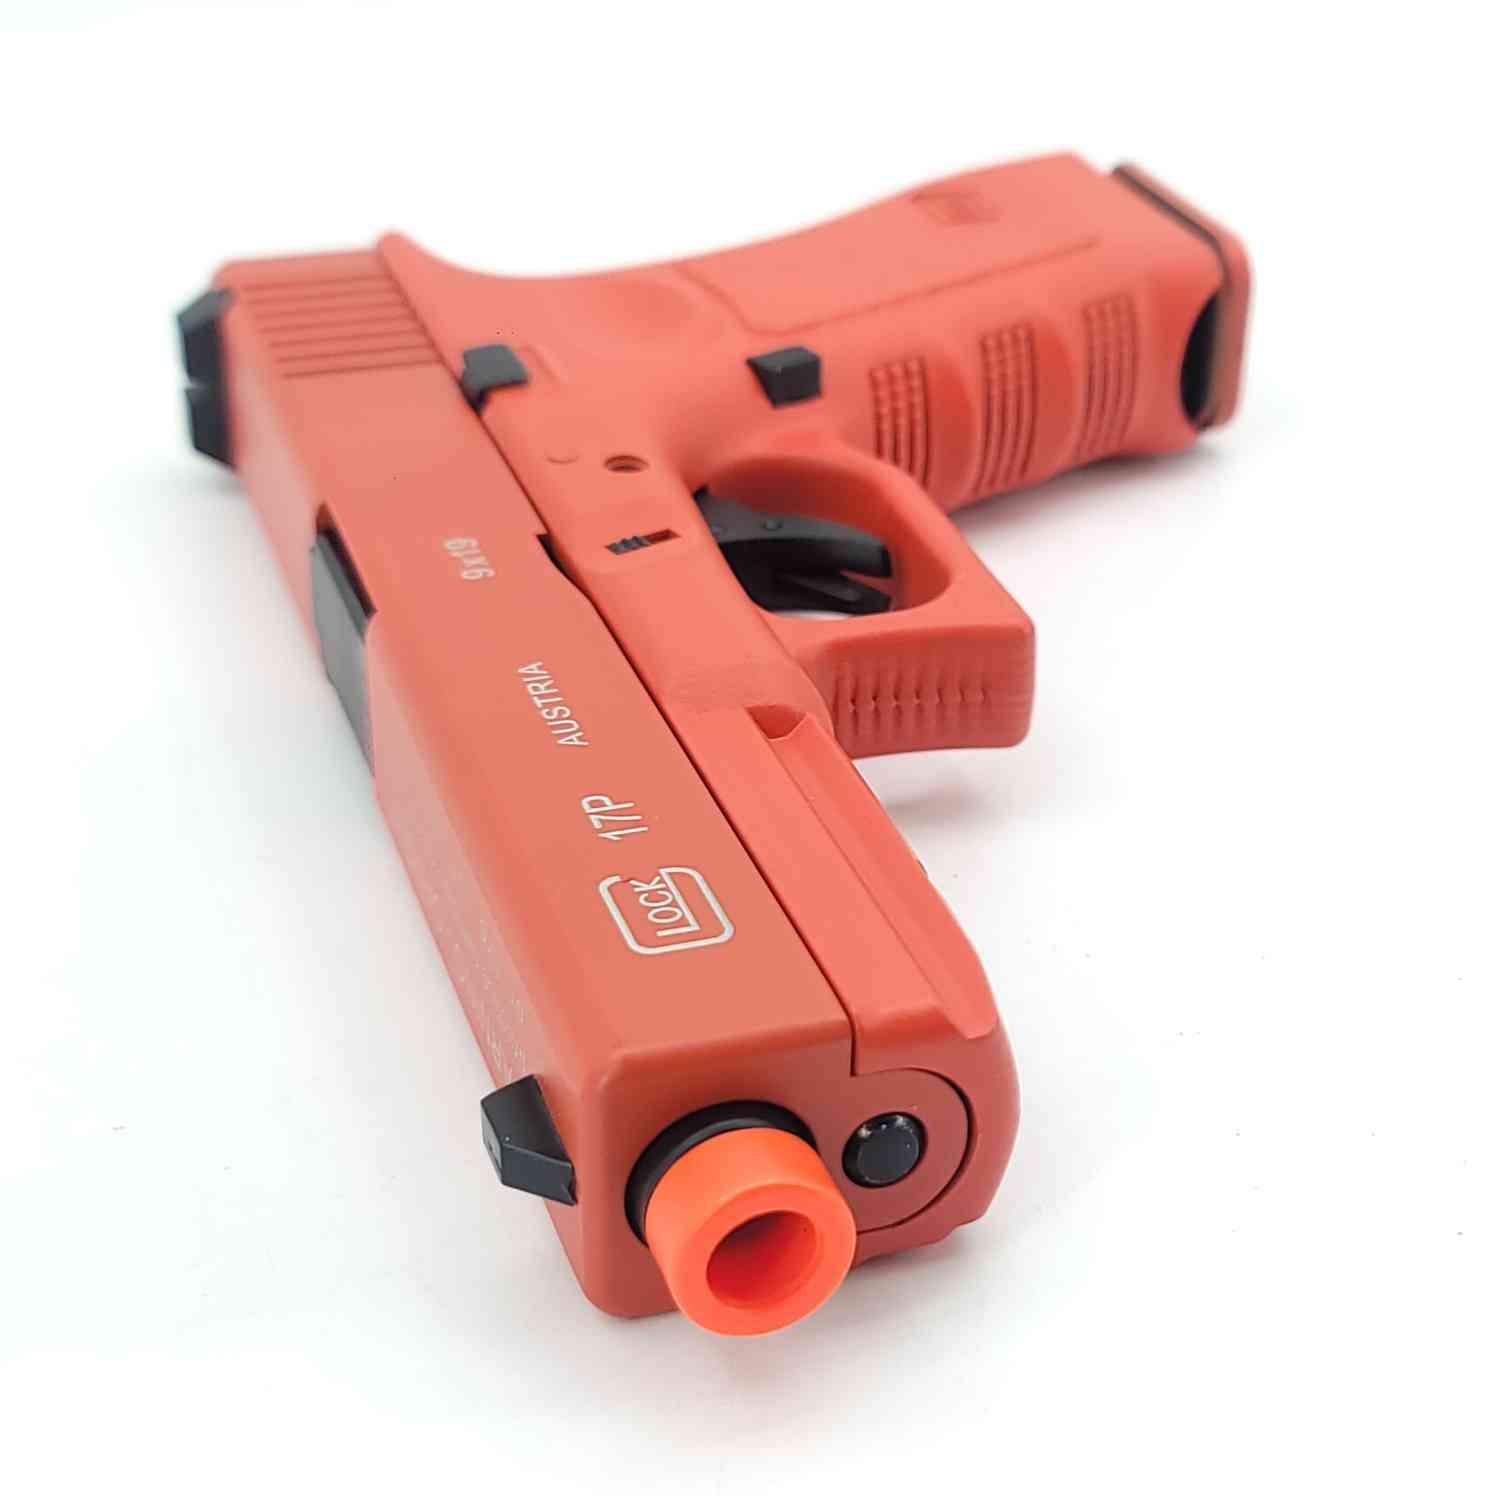 DOUBLE BELL Glock G17P Gen5 SpeedQB Gas Powered Gel Blaster RED [721-2]